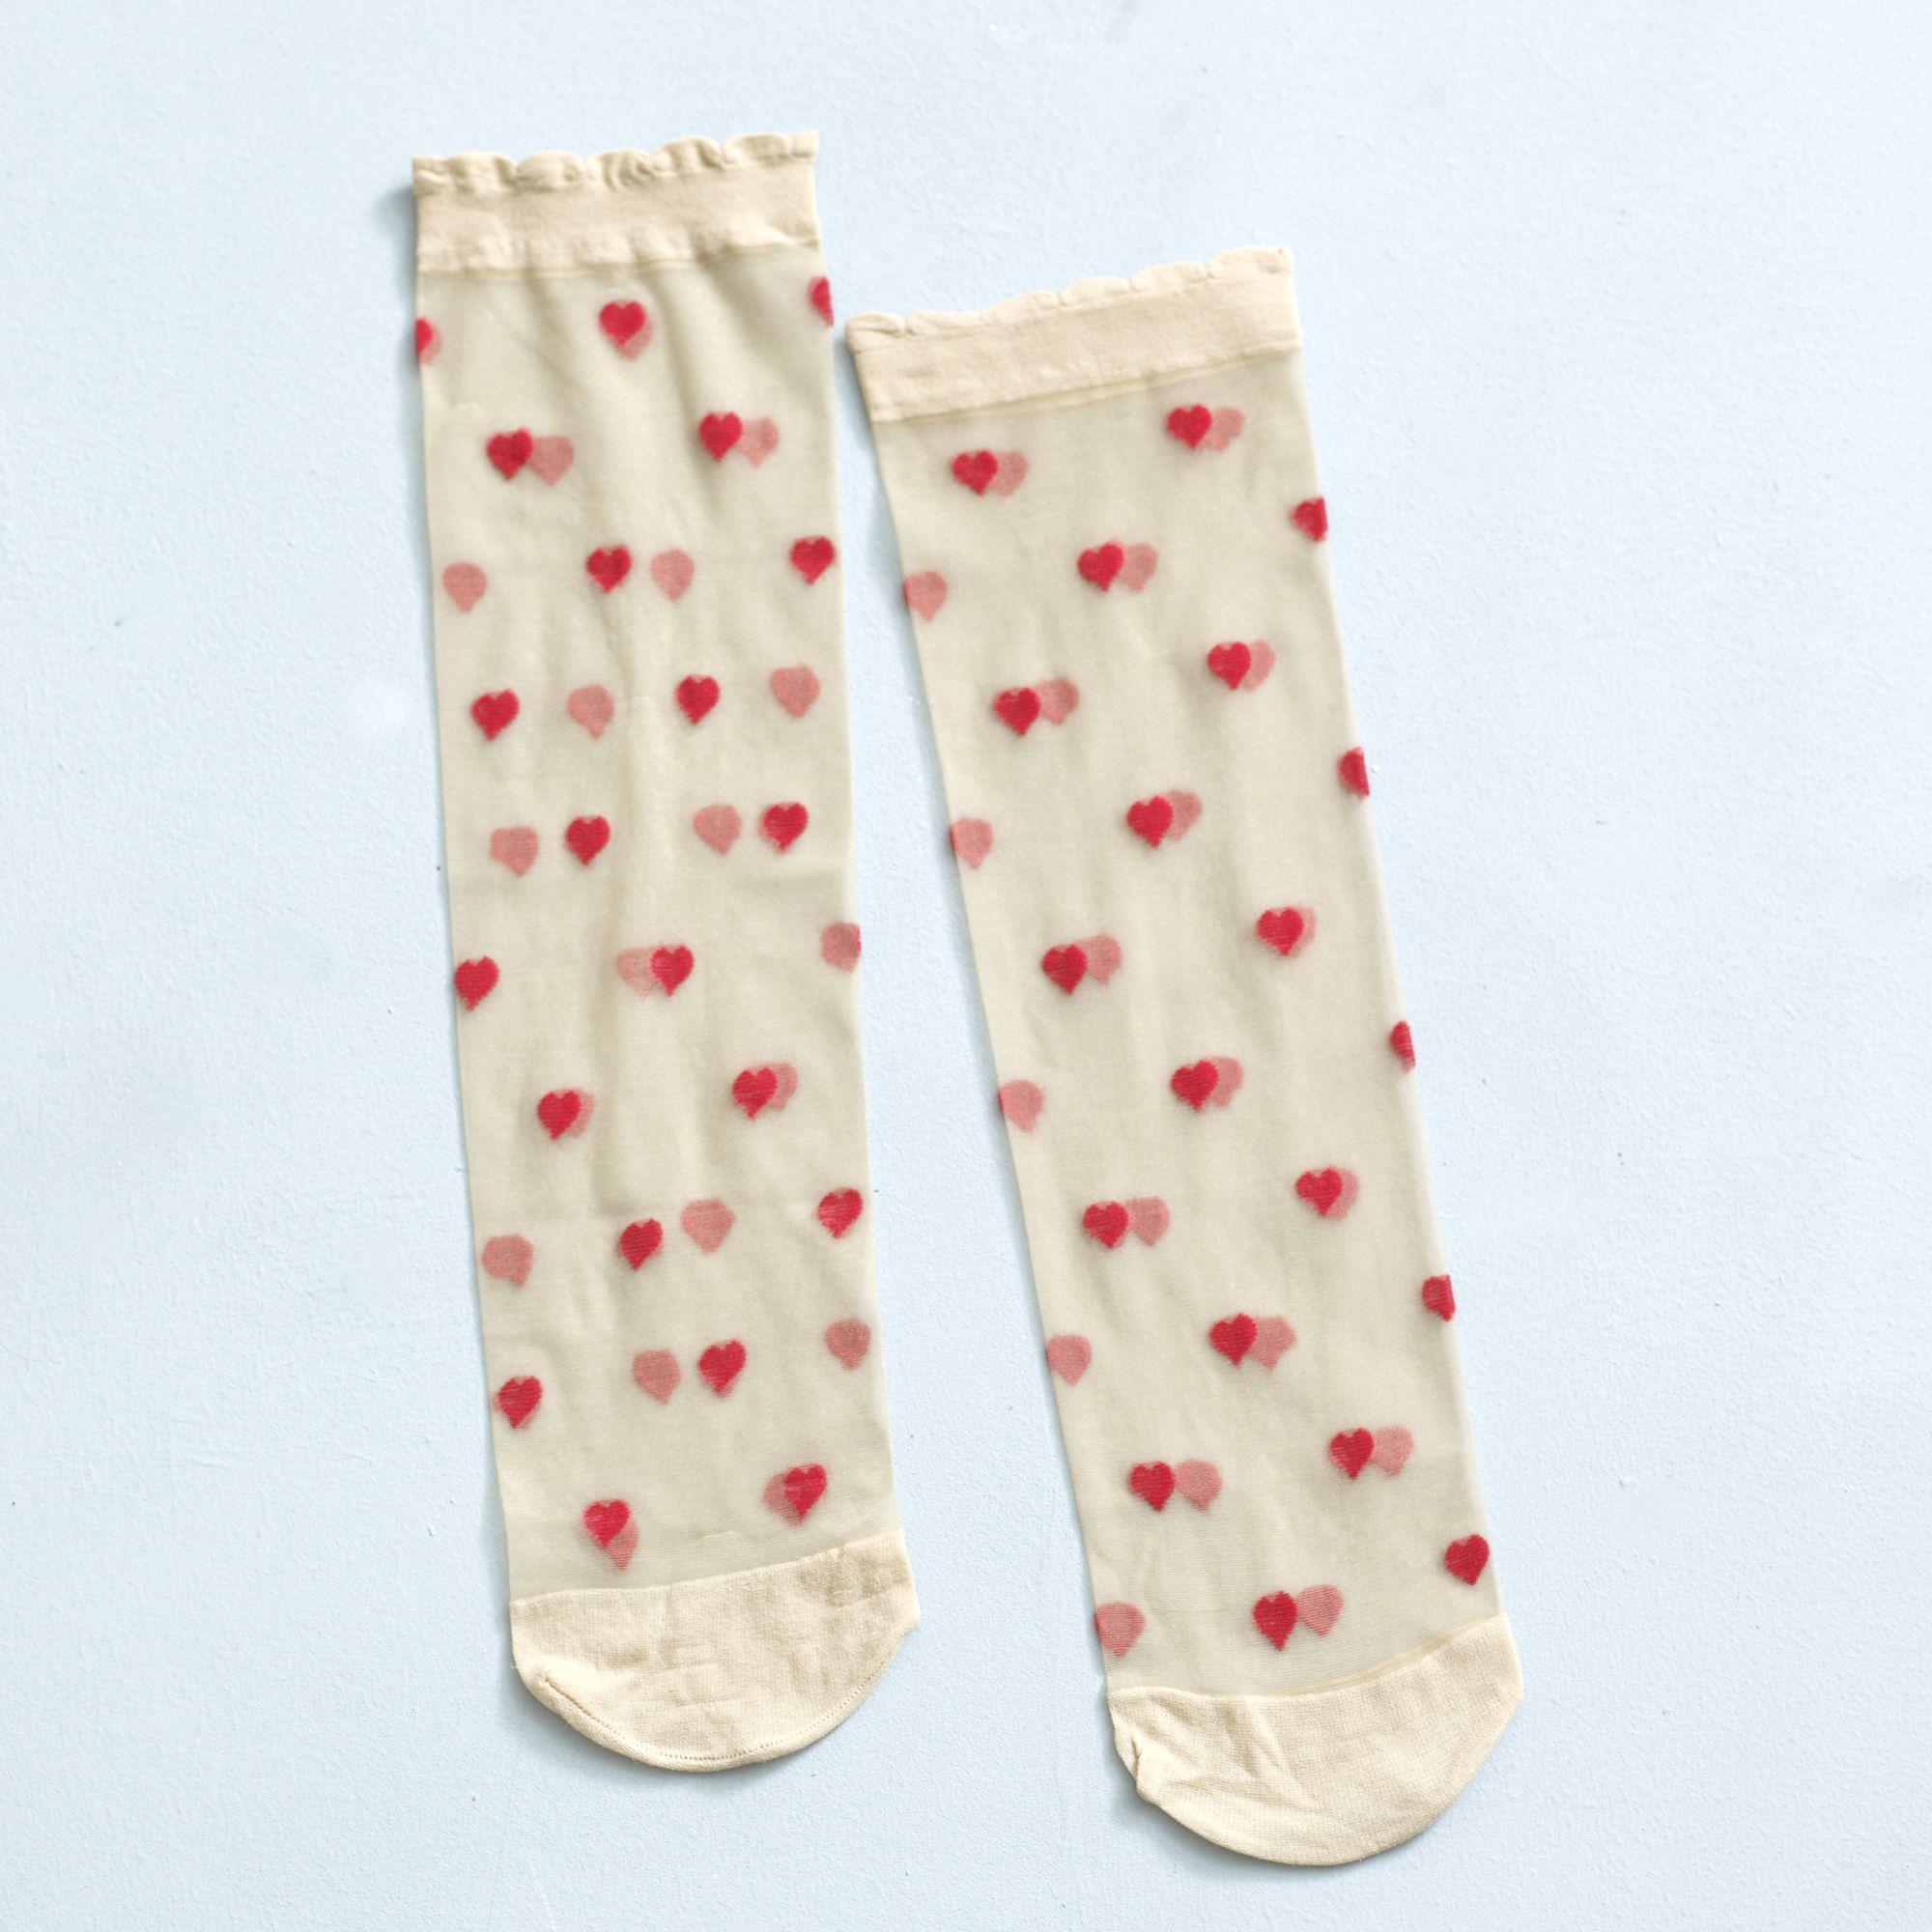 Romantic Nude Red Heart Sheer Socks X 2